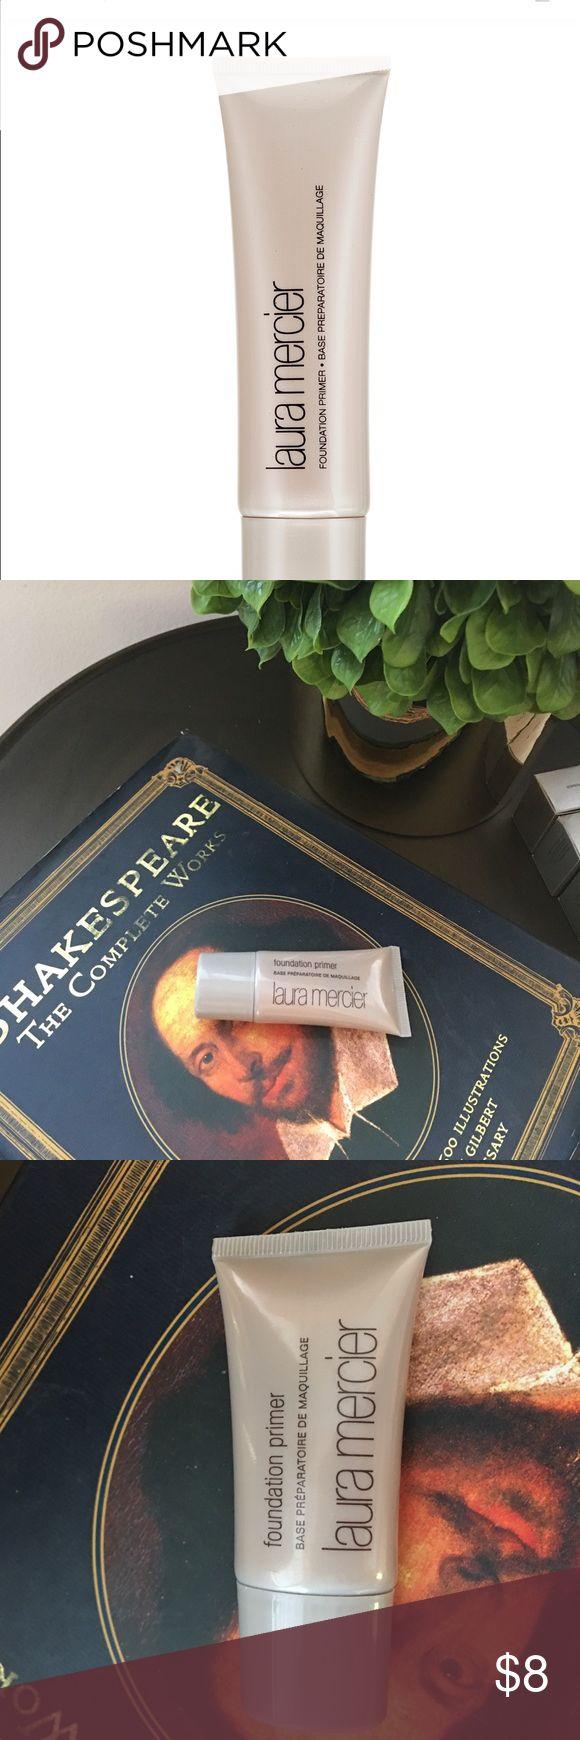 Brand New Unopened Laura Mercier Foundation Primer Brand new! laura mercier Makeup Face Primer